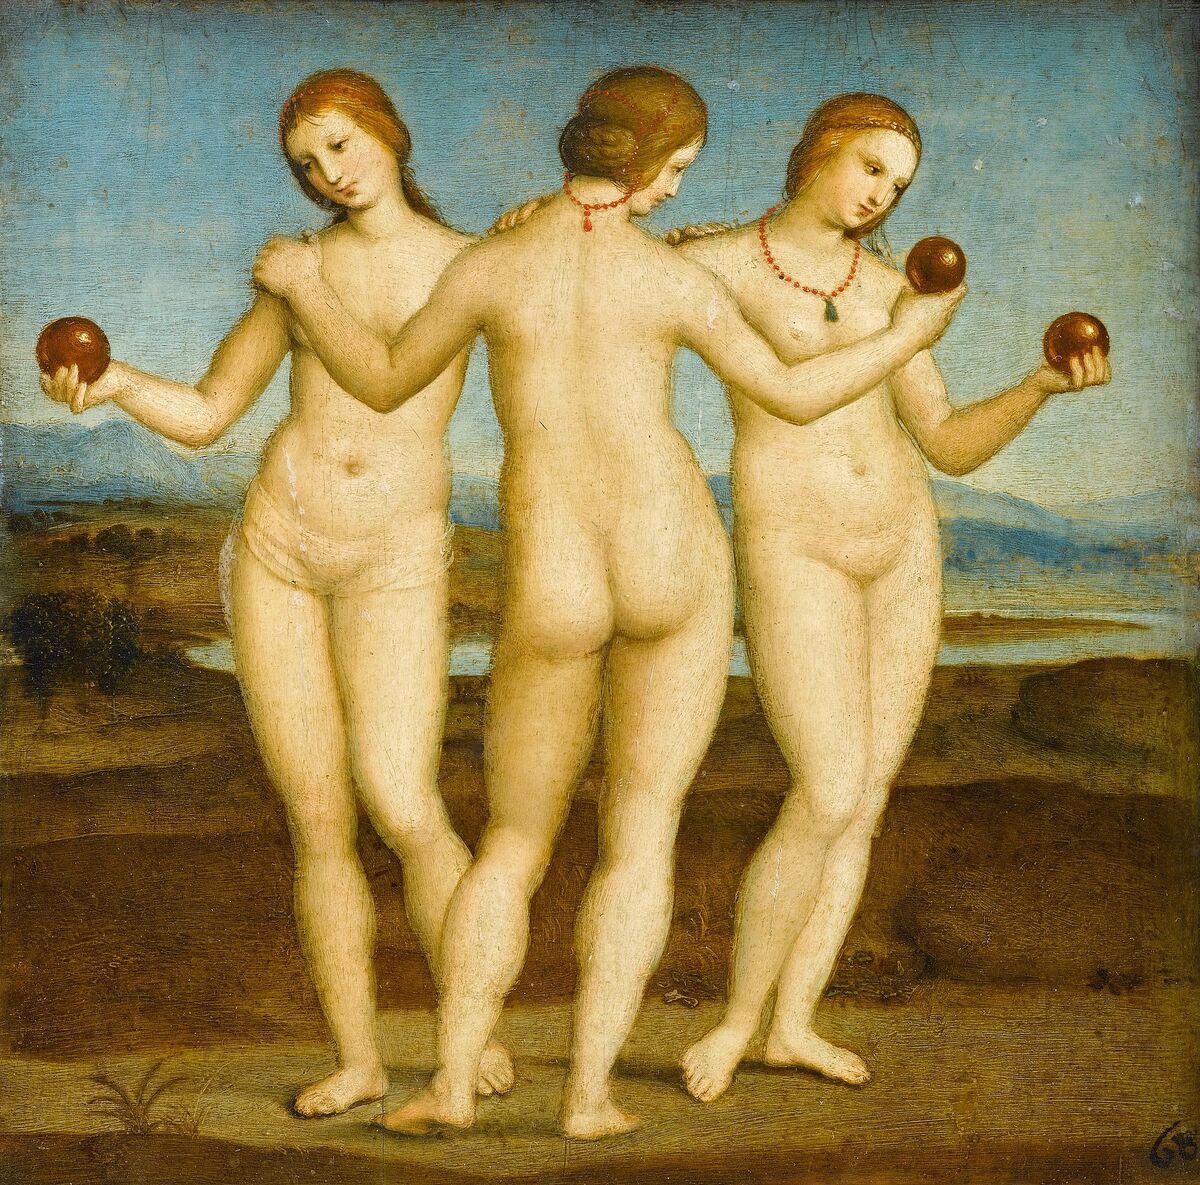 Raphael, The Three Graces, 1504. Image via Wikimedia Commons.